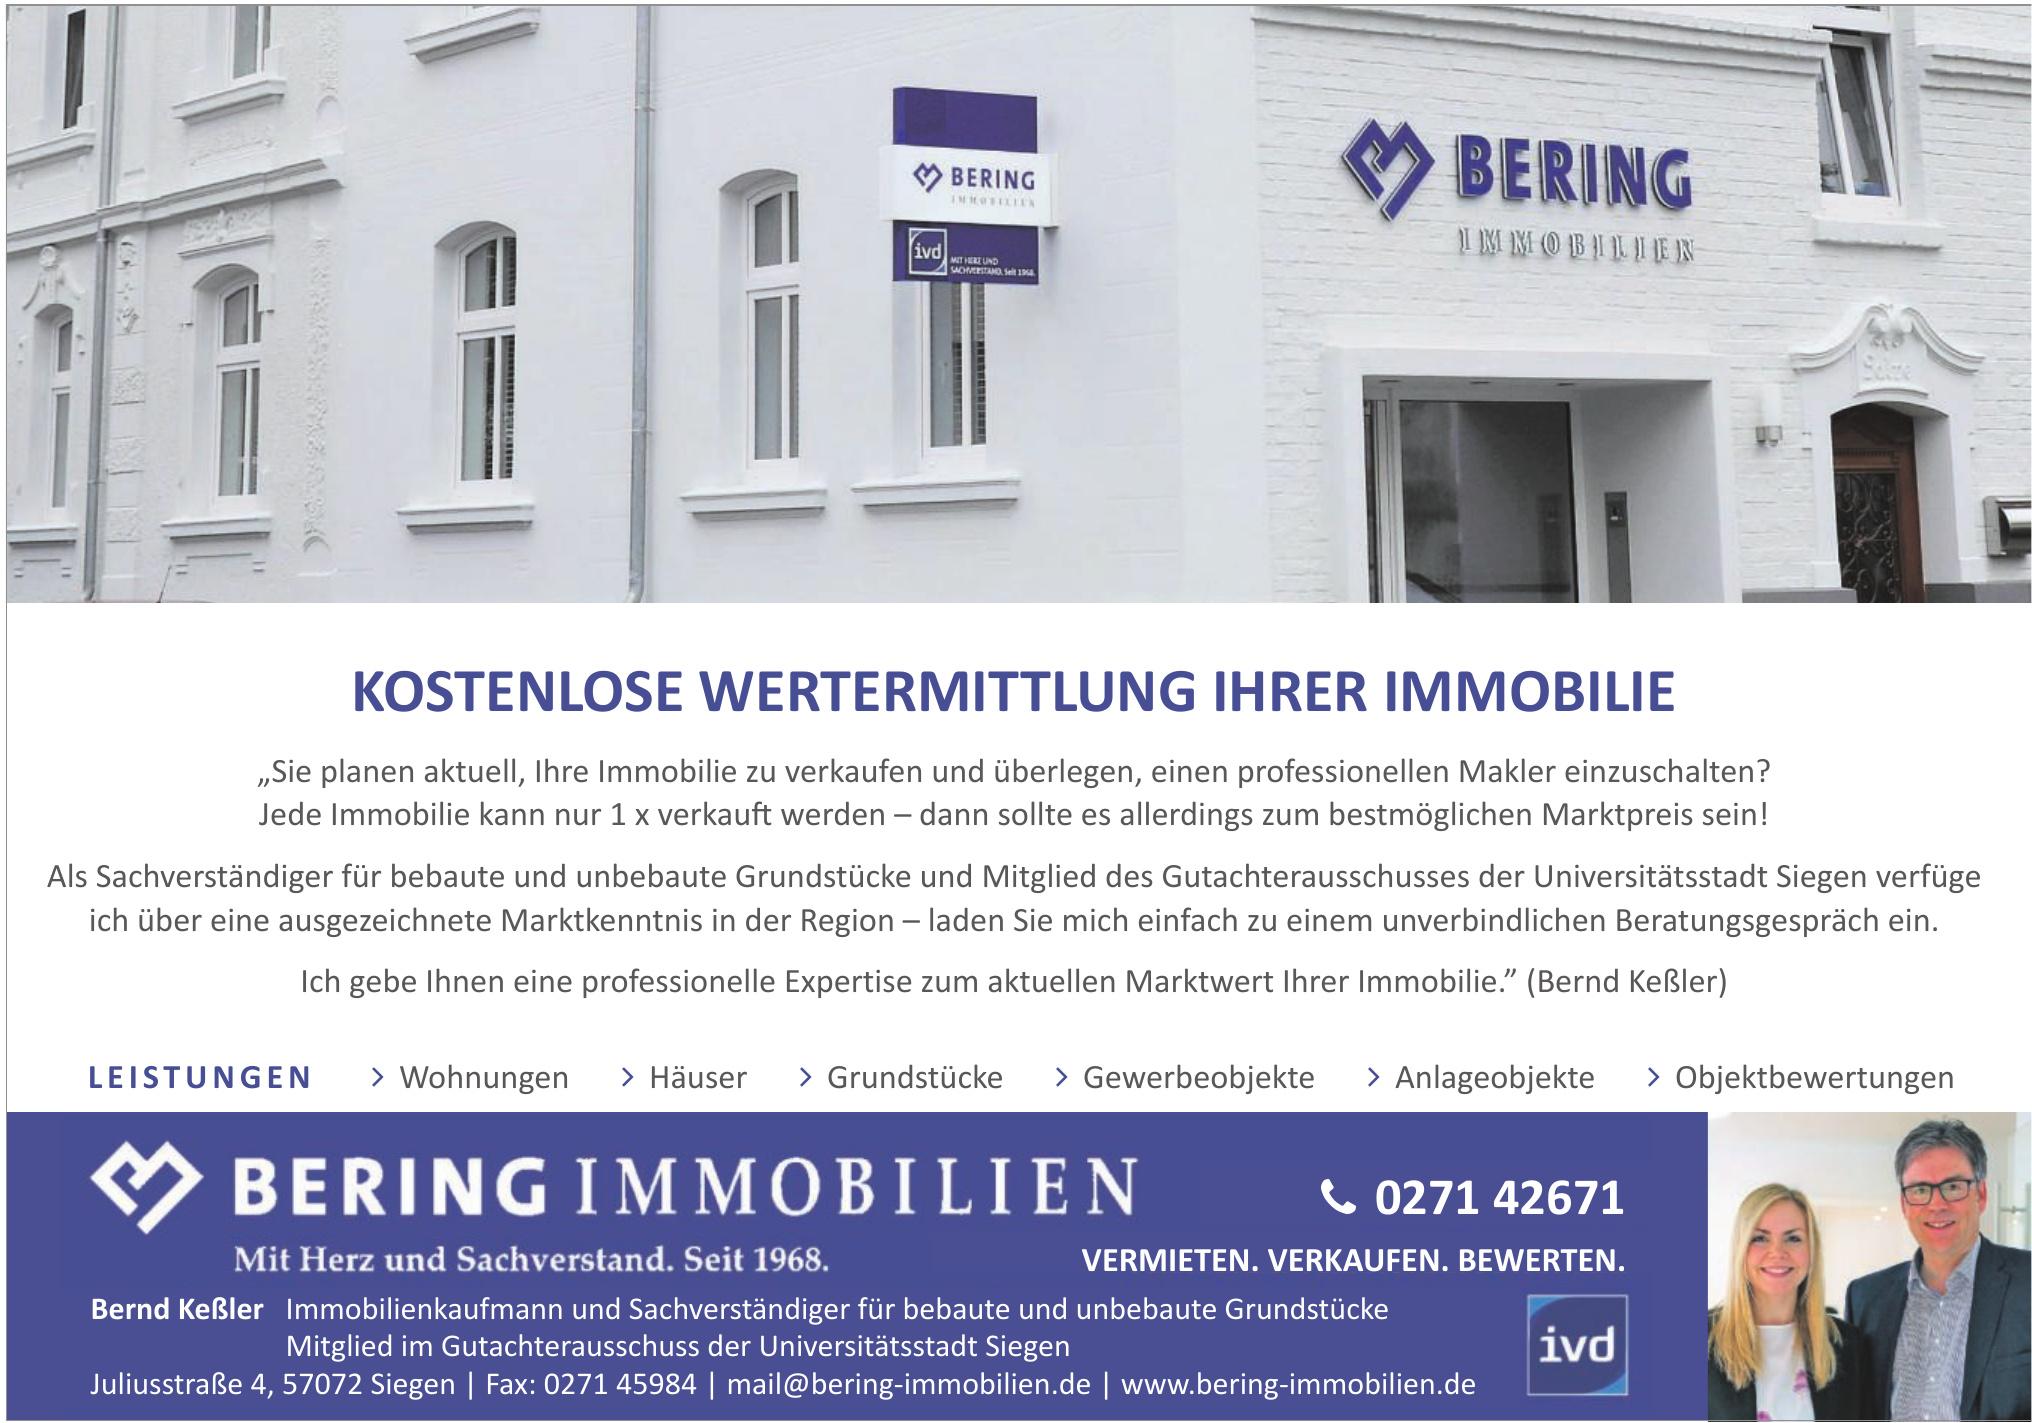 BERING IMMOBILIEN IVD